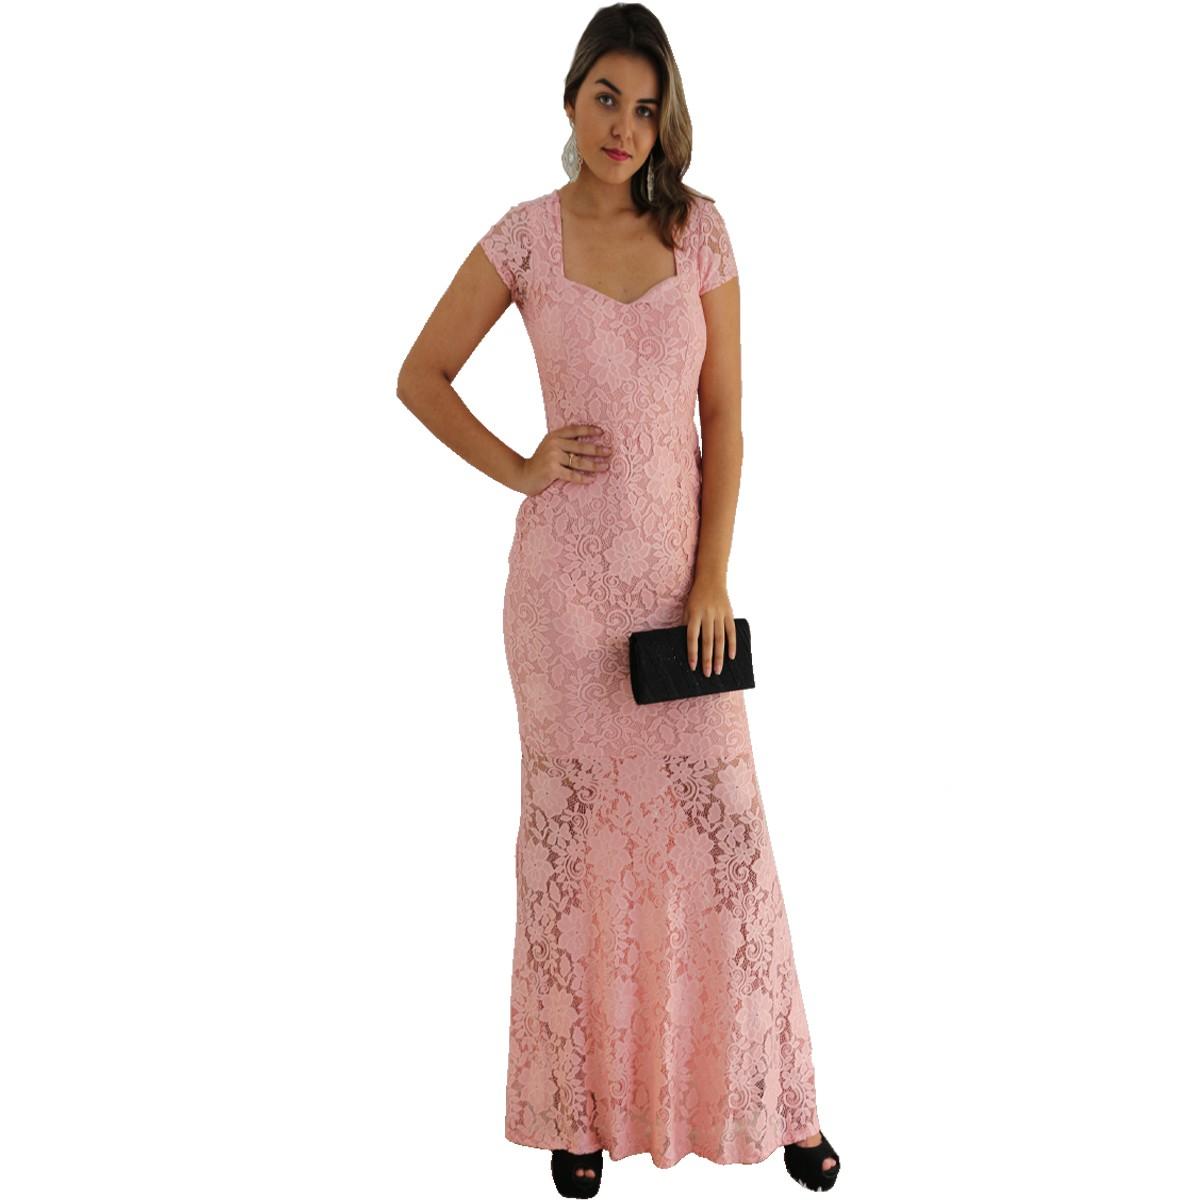 Vestido Longo Rosa Nude Renda C/ Forro E Bojo